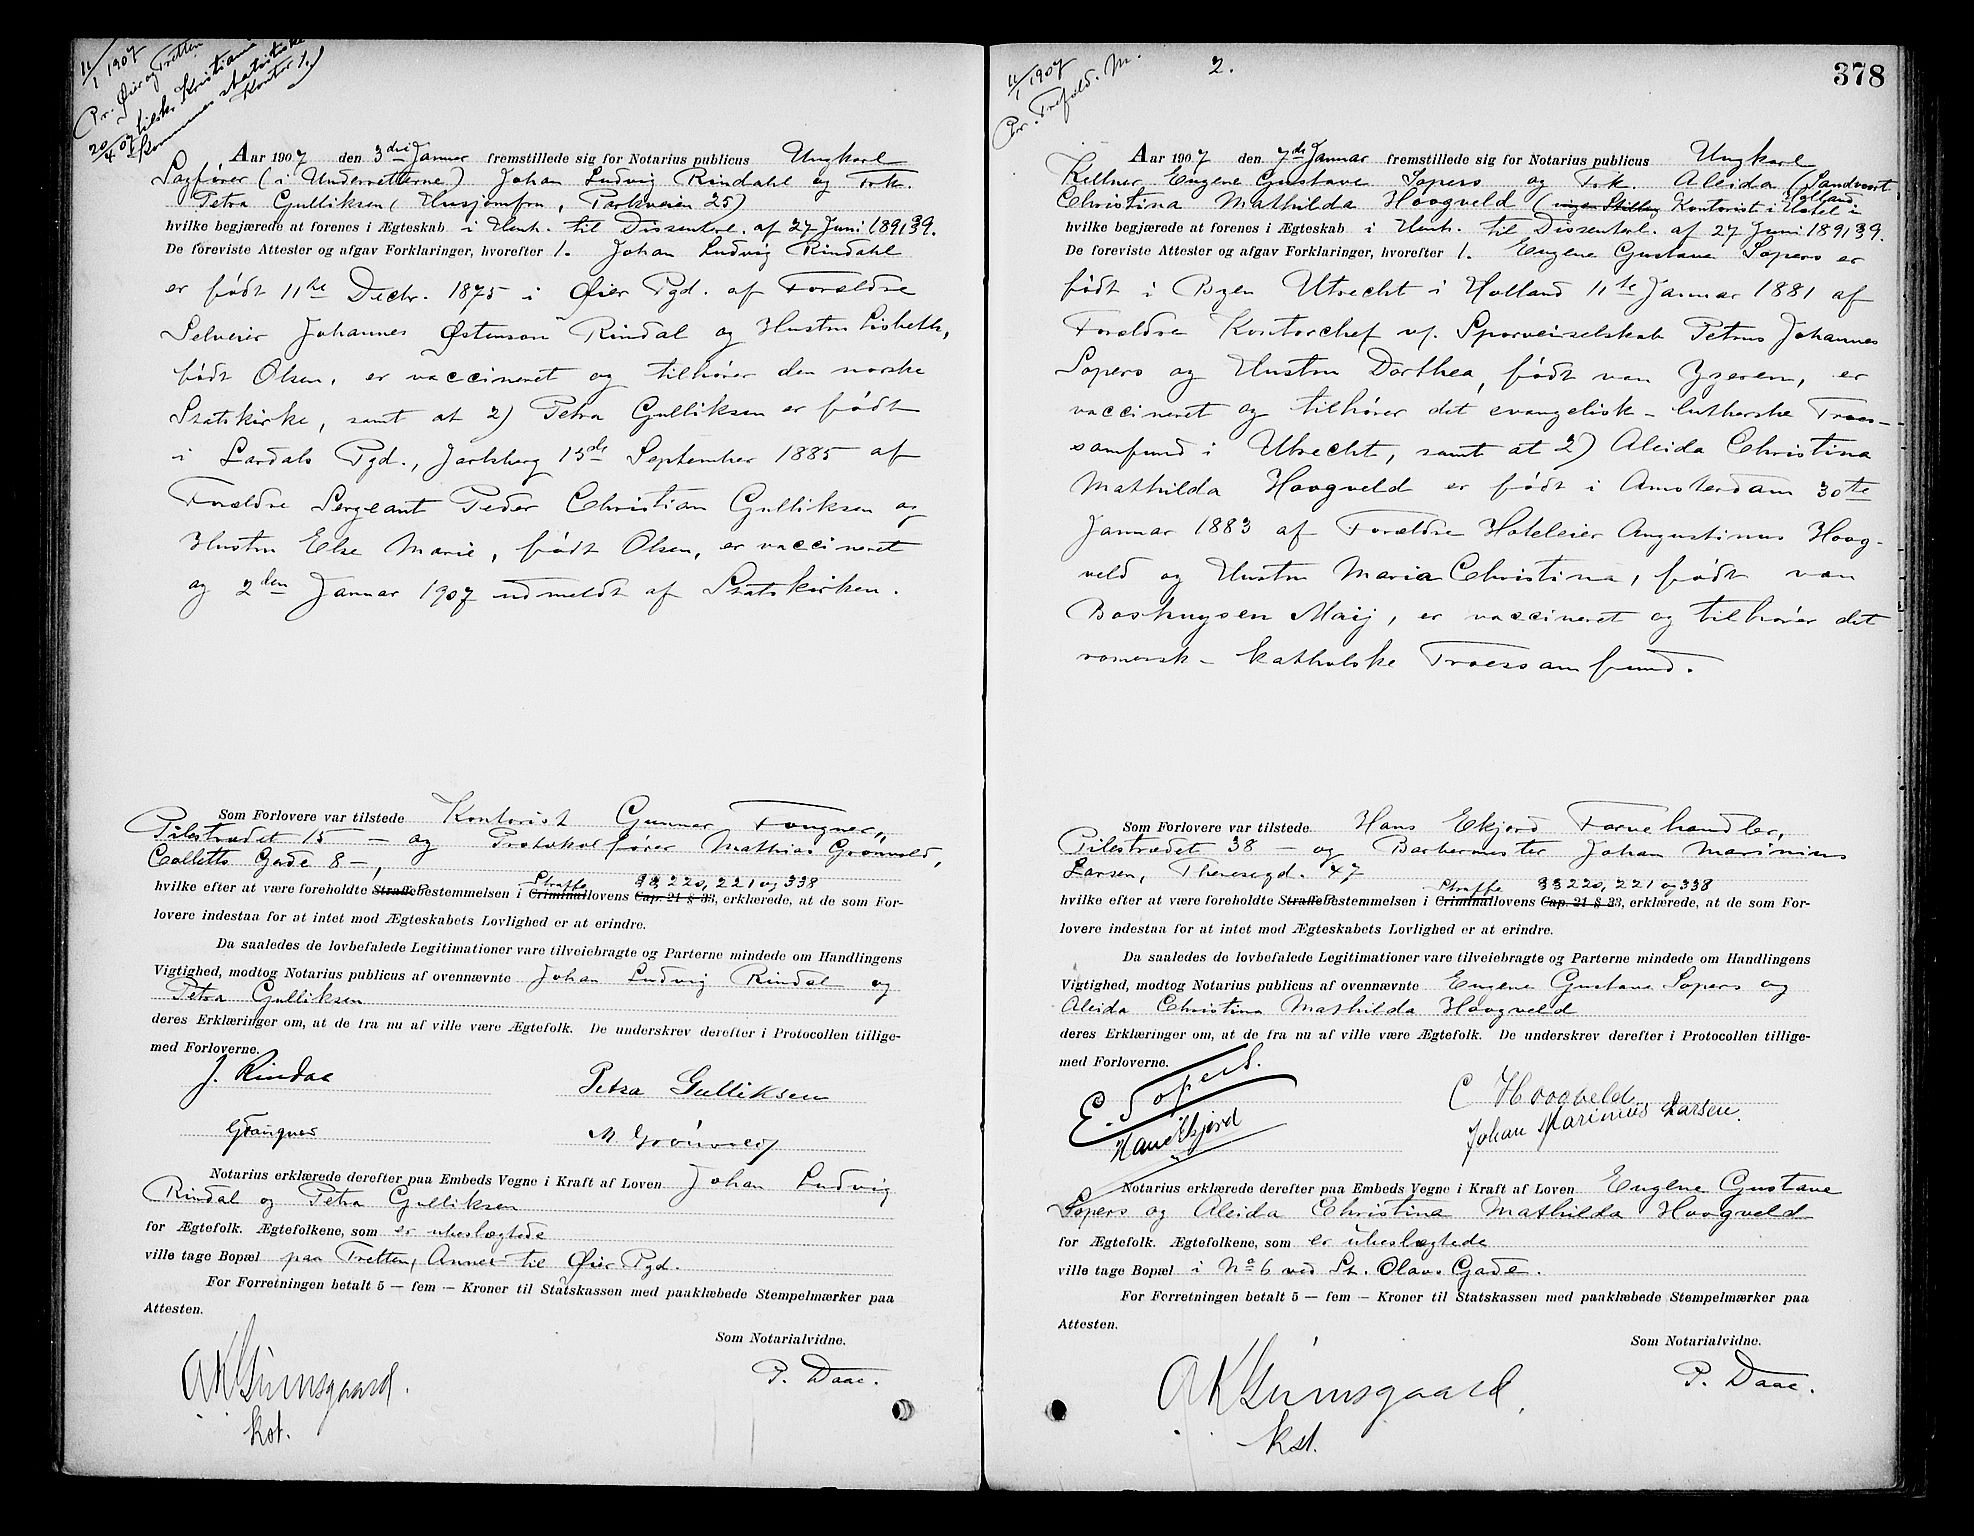 SAO, Oslo byfogd avd. I, L/Lb/Lbb/L0006: Notarialprotokoll, rekke II: Vigsler, 1902-1907, s. 377b-378a